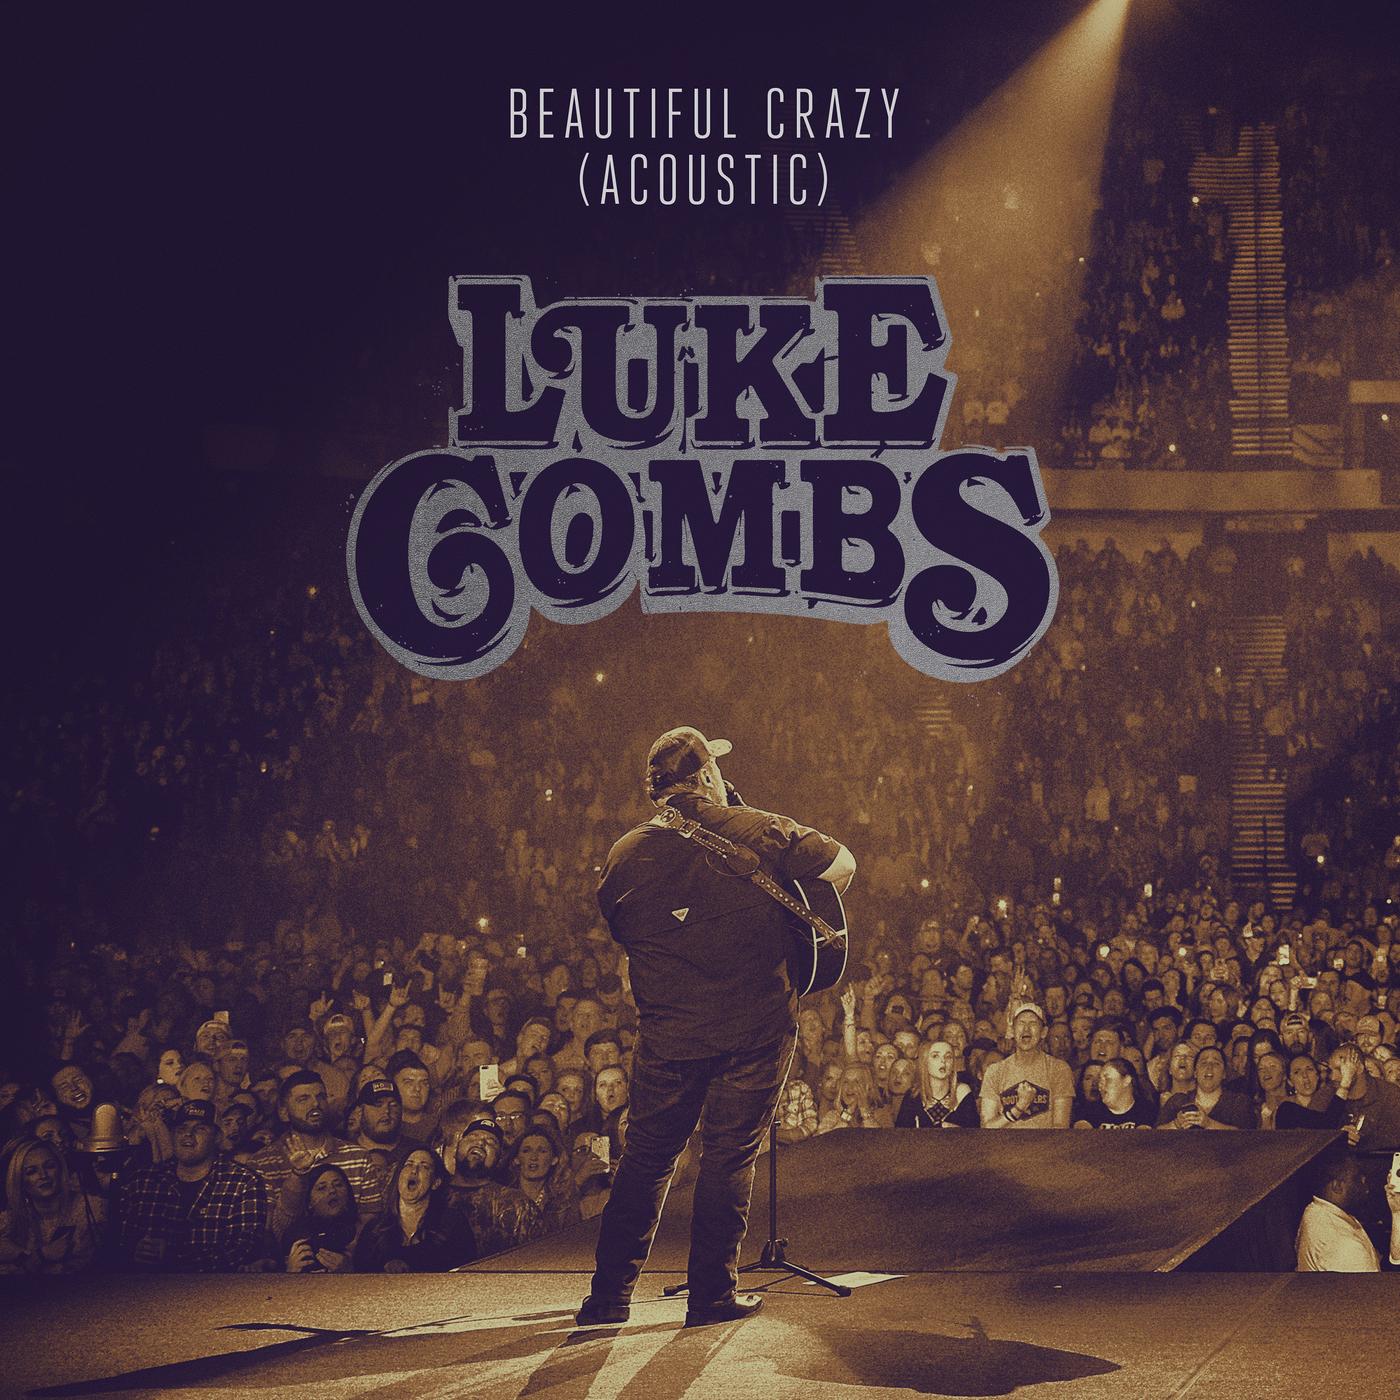 Beautiful Crazy (Acoustic) - Luke Combs